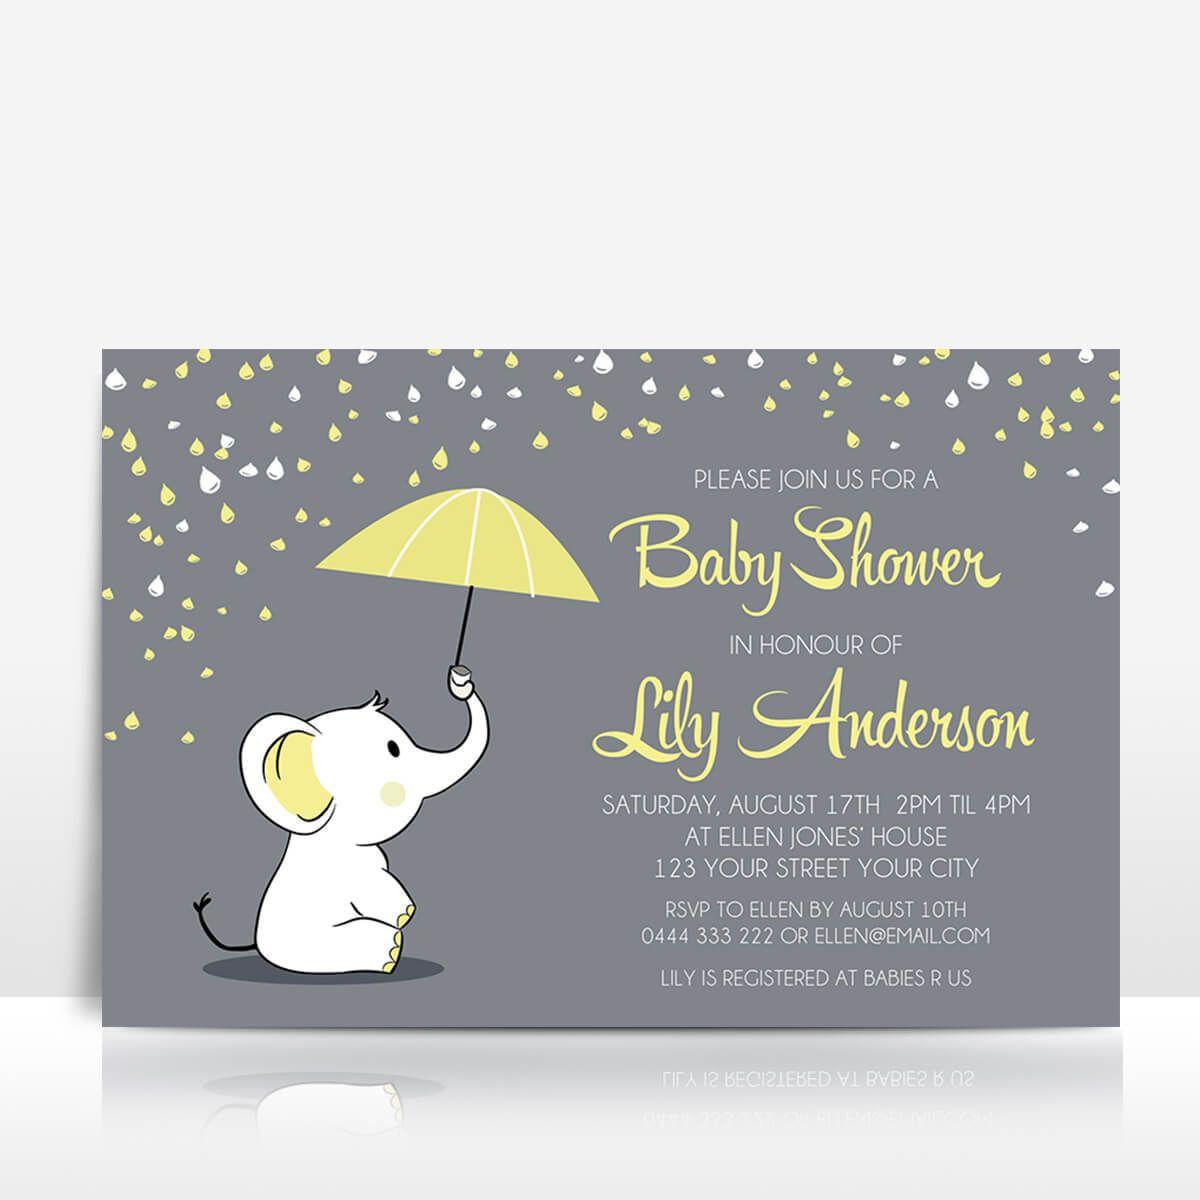 Elephant baby shower invitation yellow on grey with umbrella ...